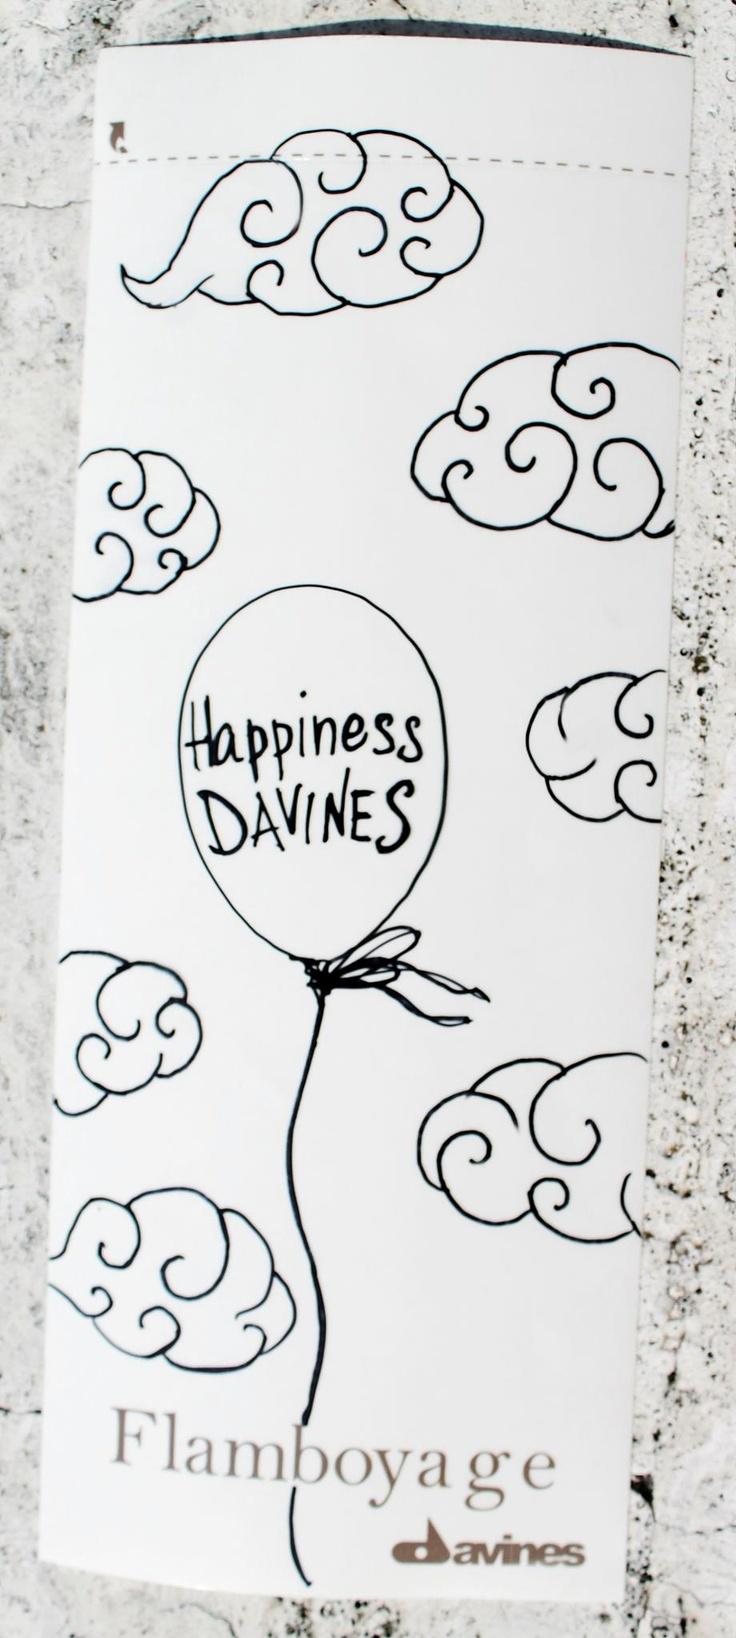 #Flamboyage #Davines #Happiness